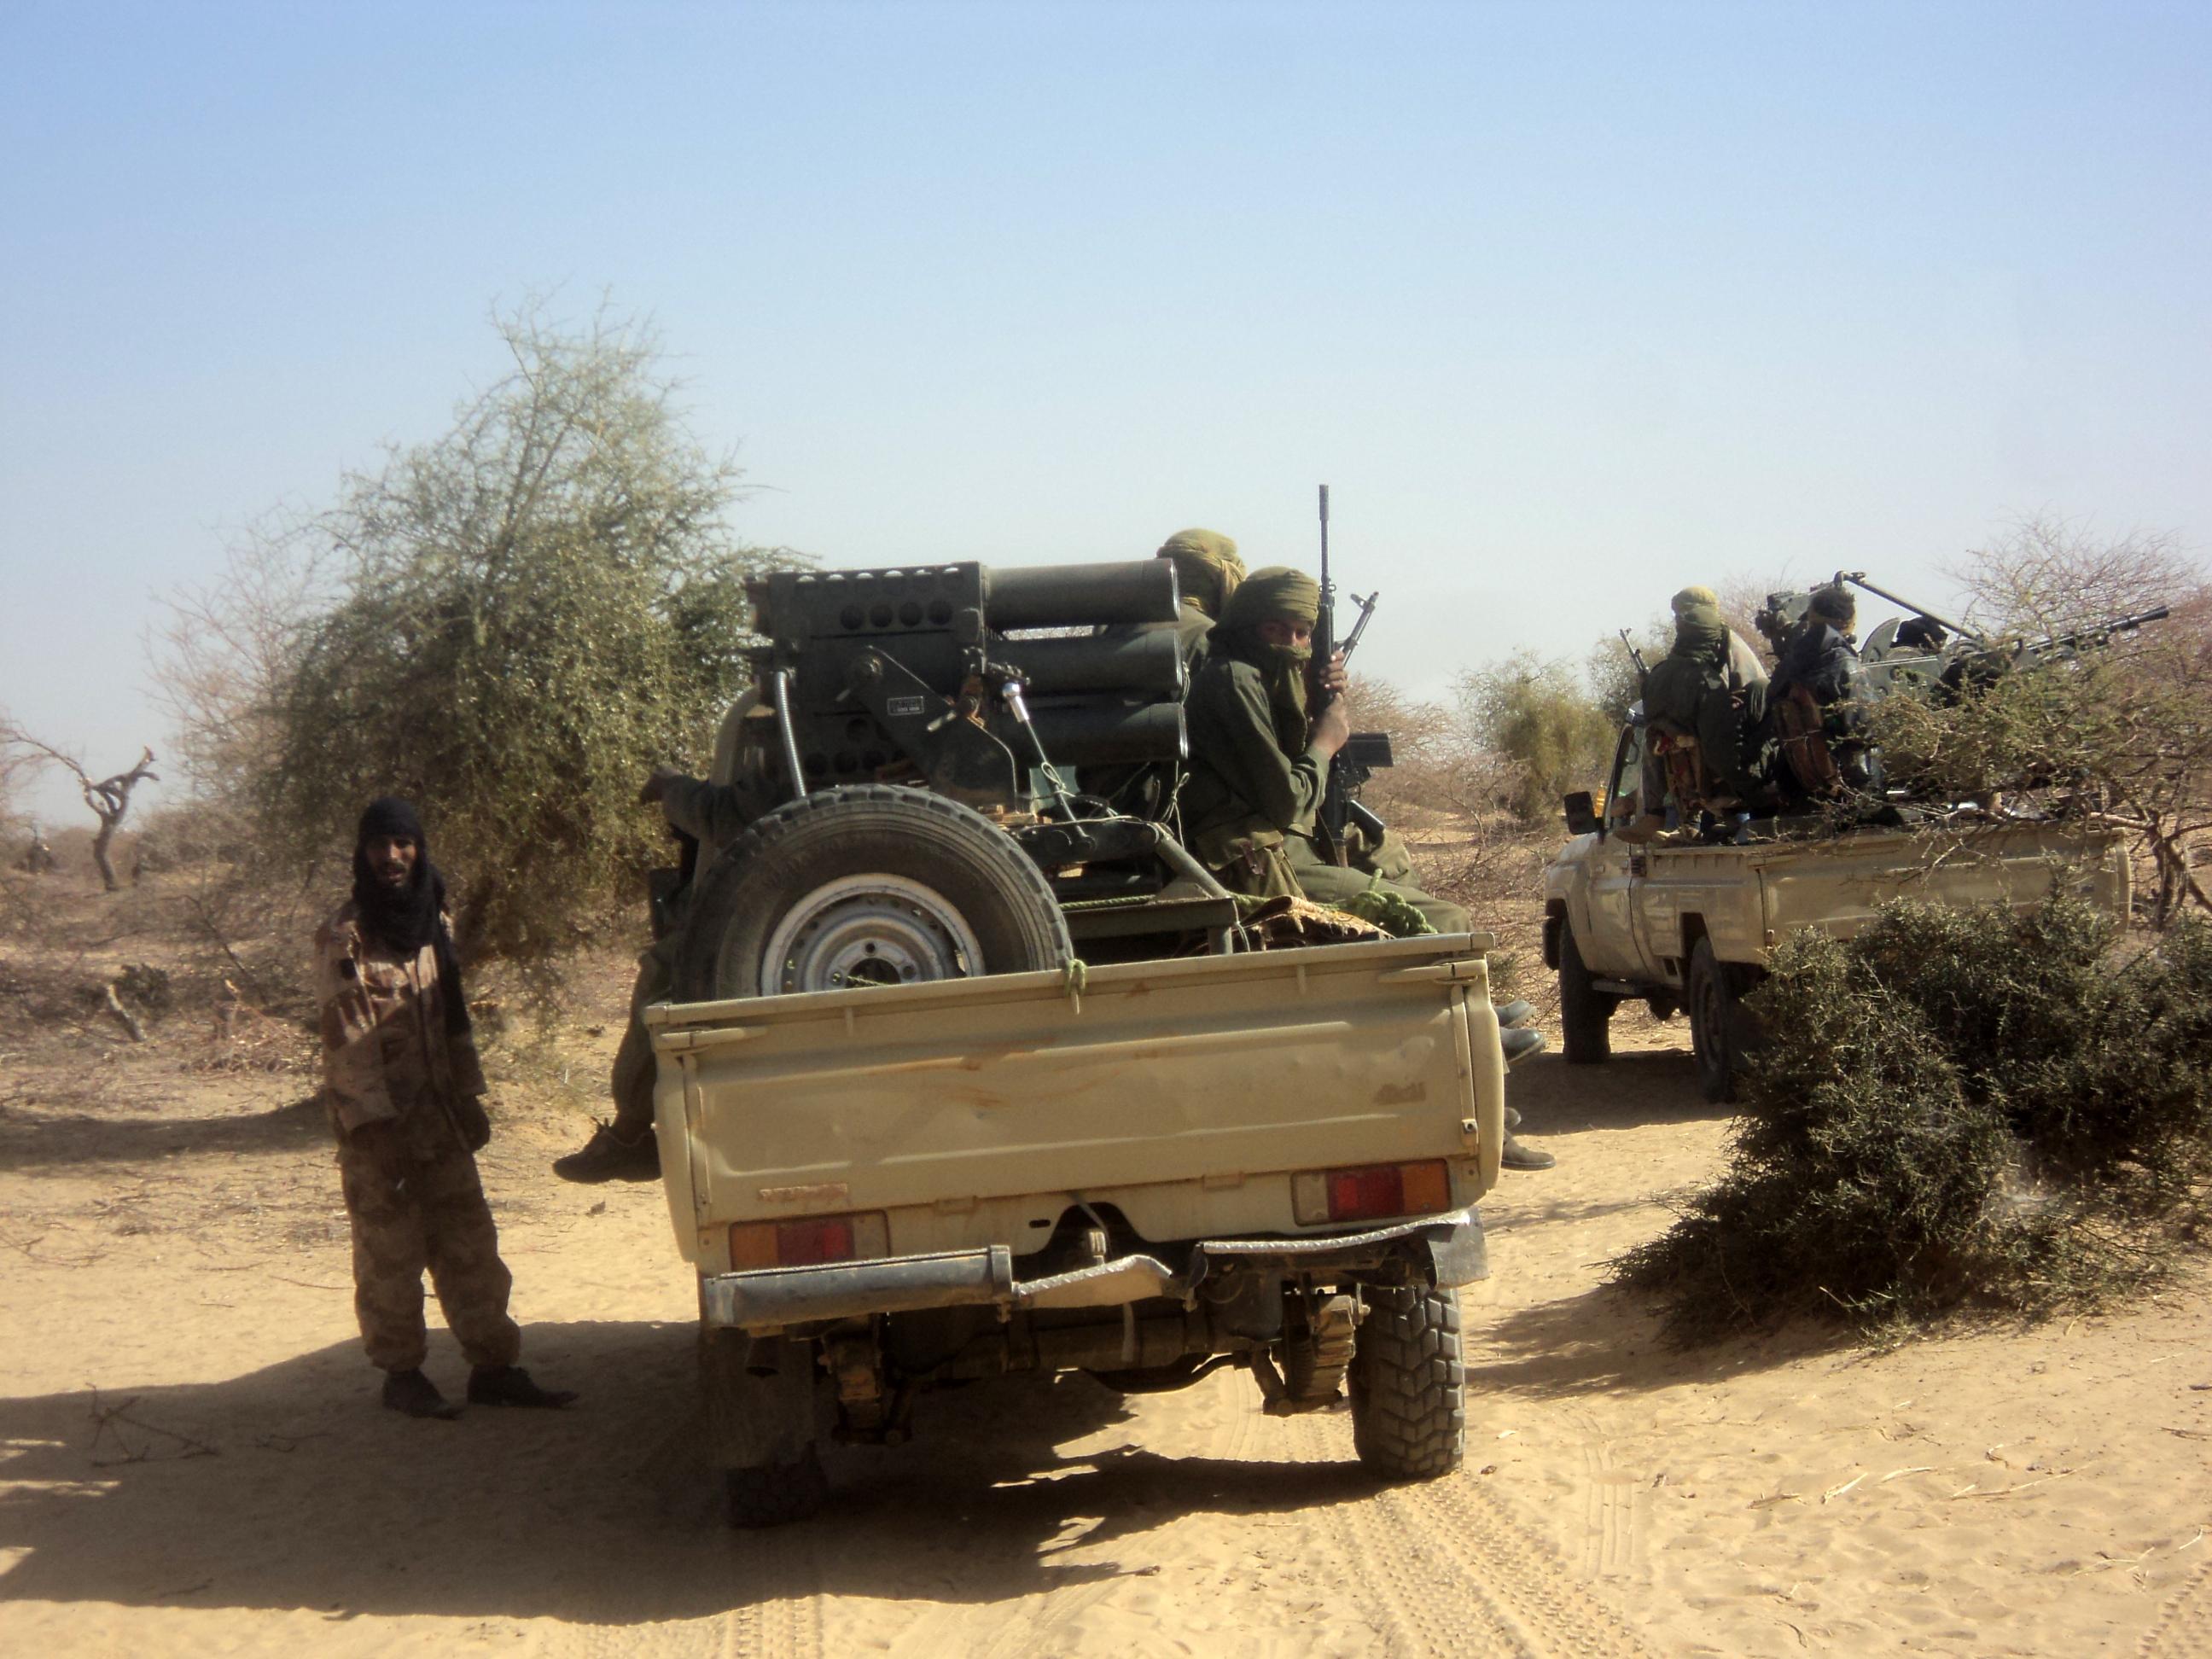 0924b1f240 Guerra in Mali - Wikipedia